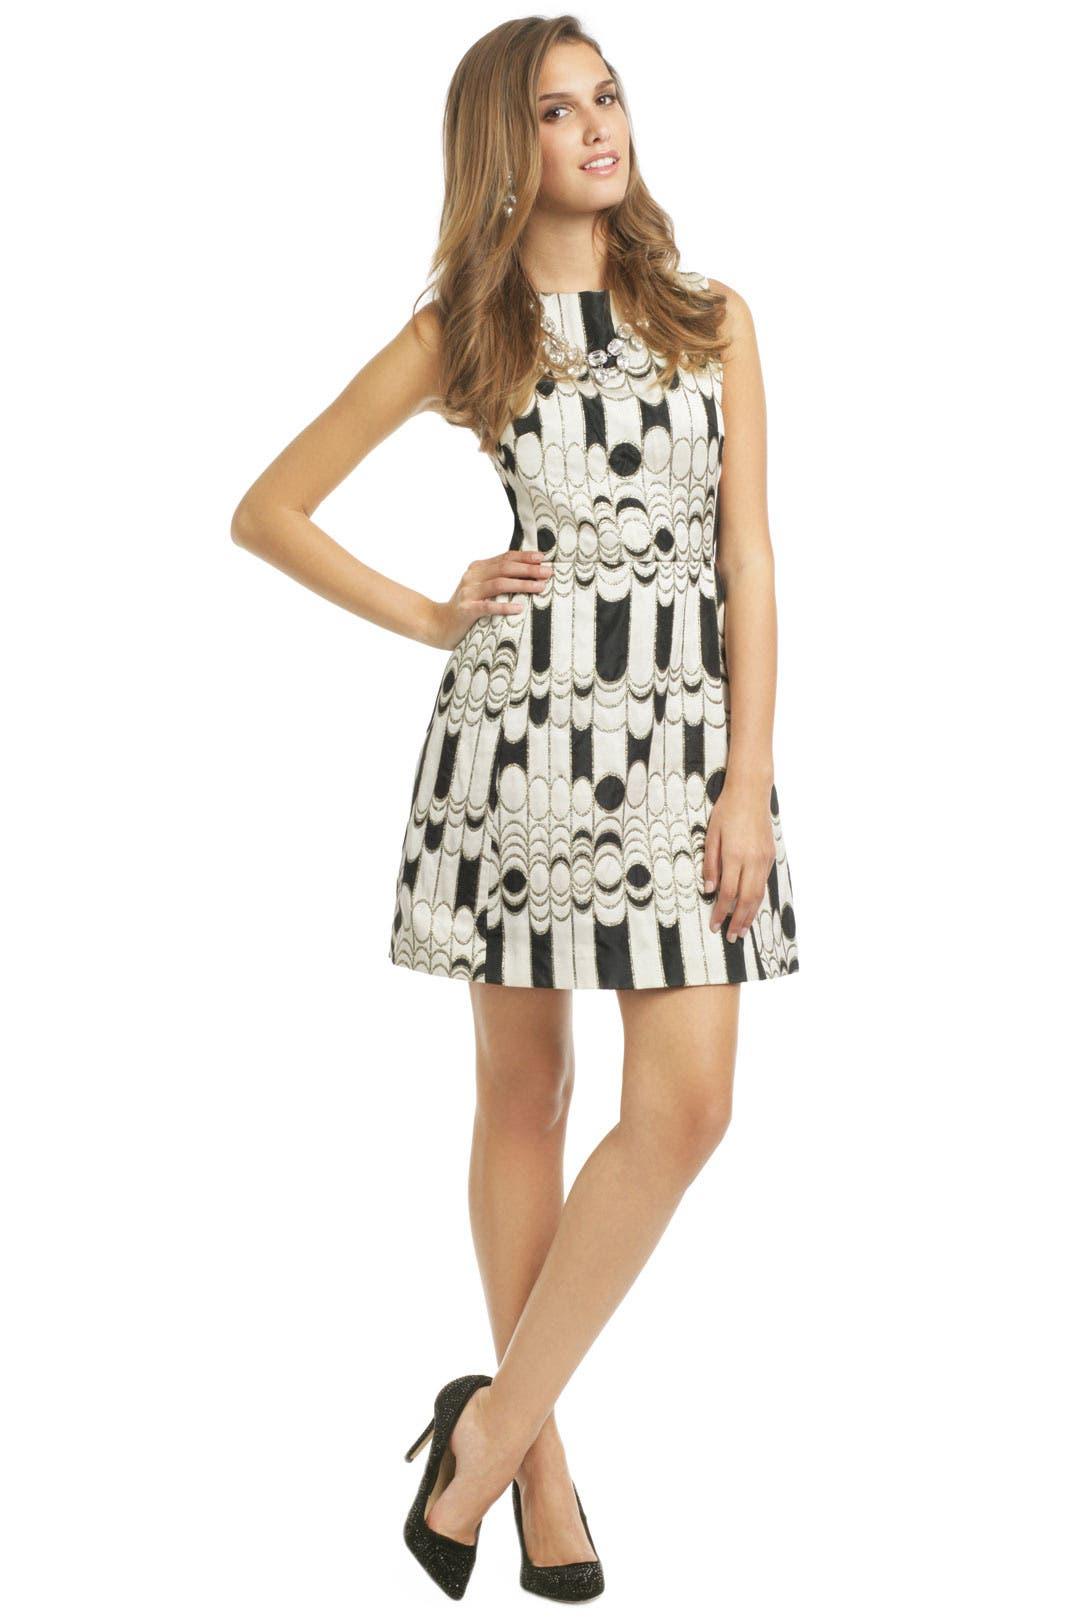 Chessboard Dress by Shoshanna